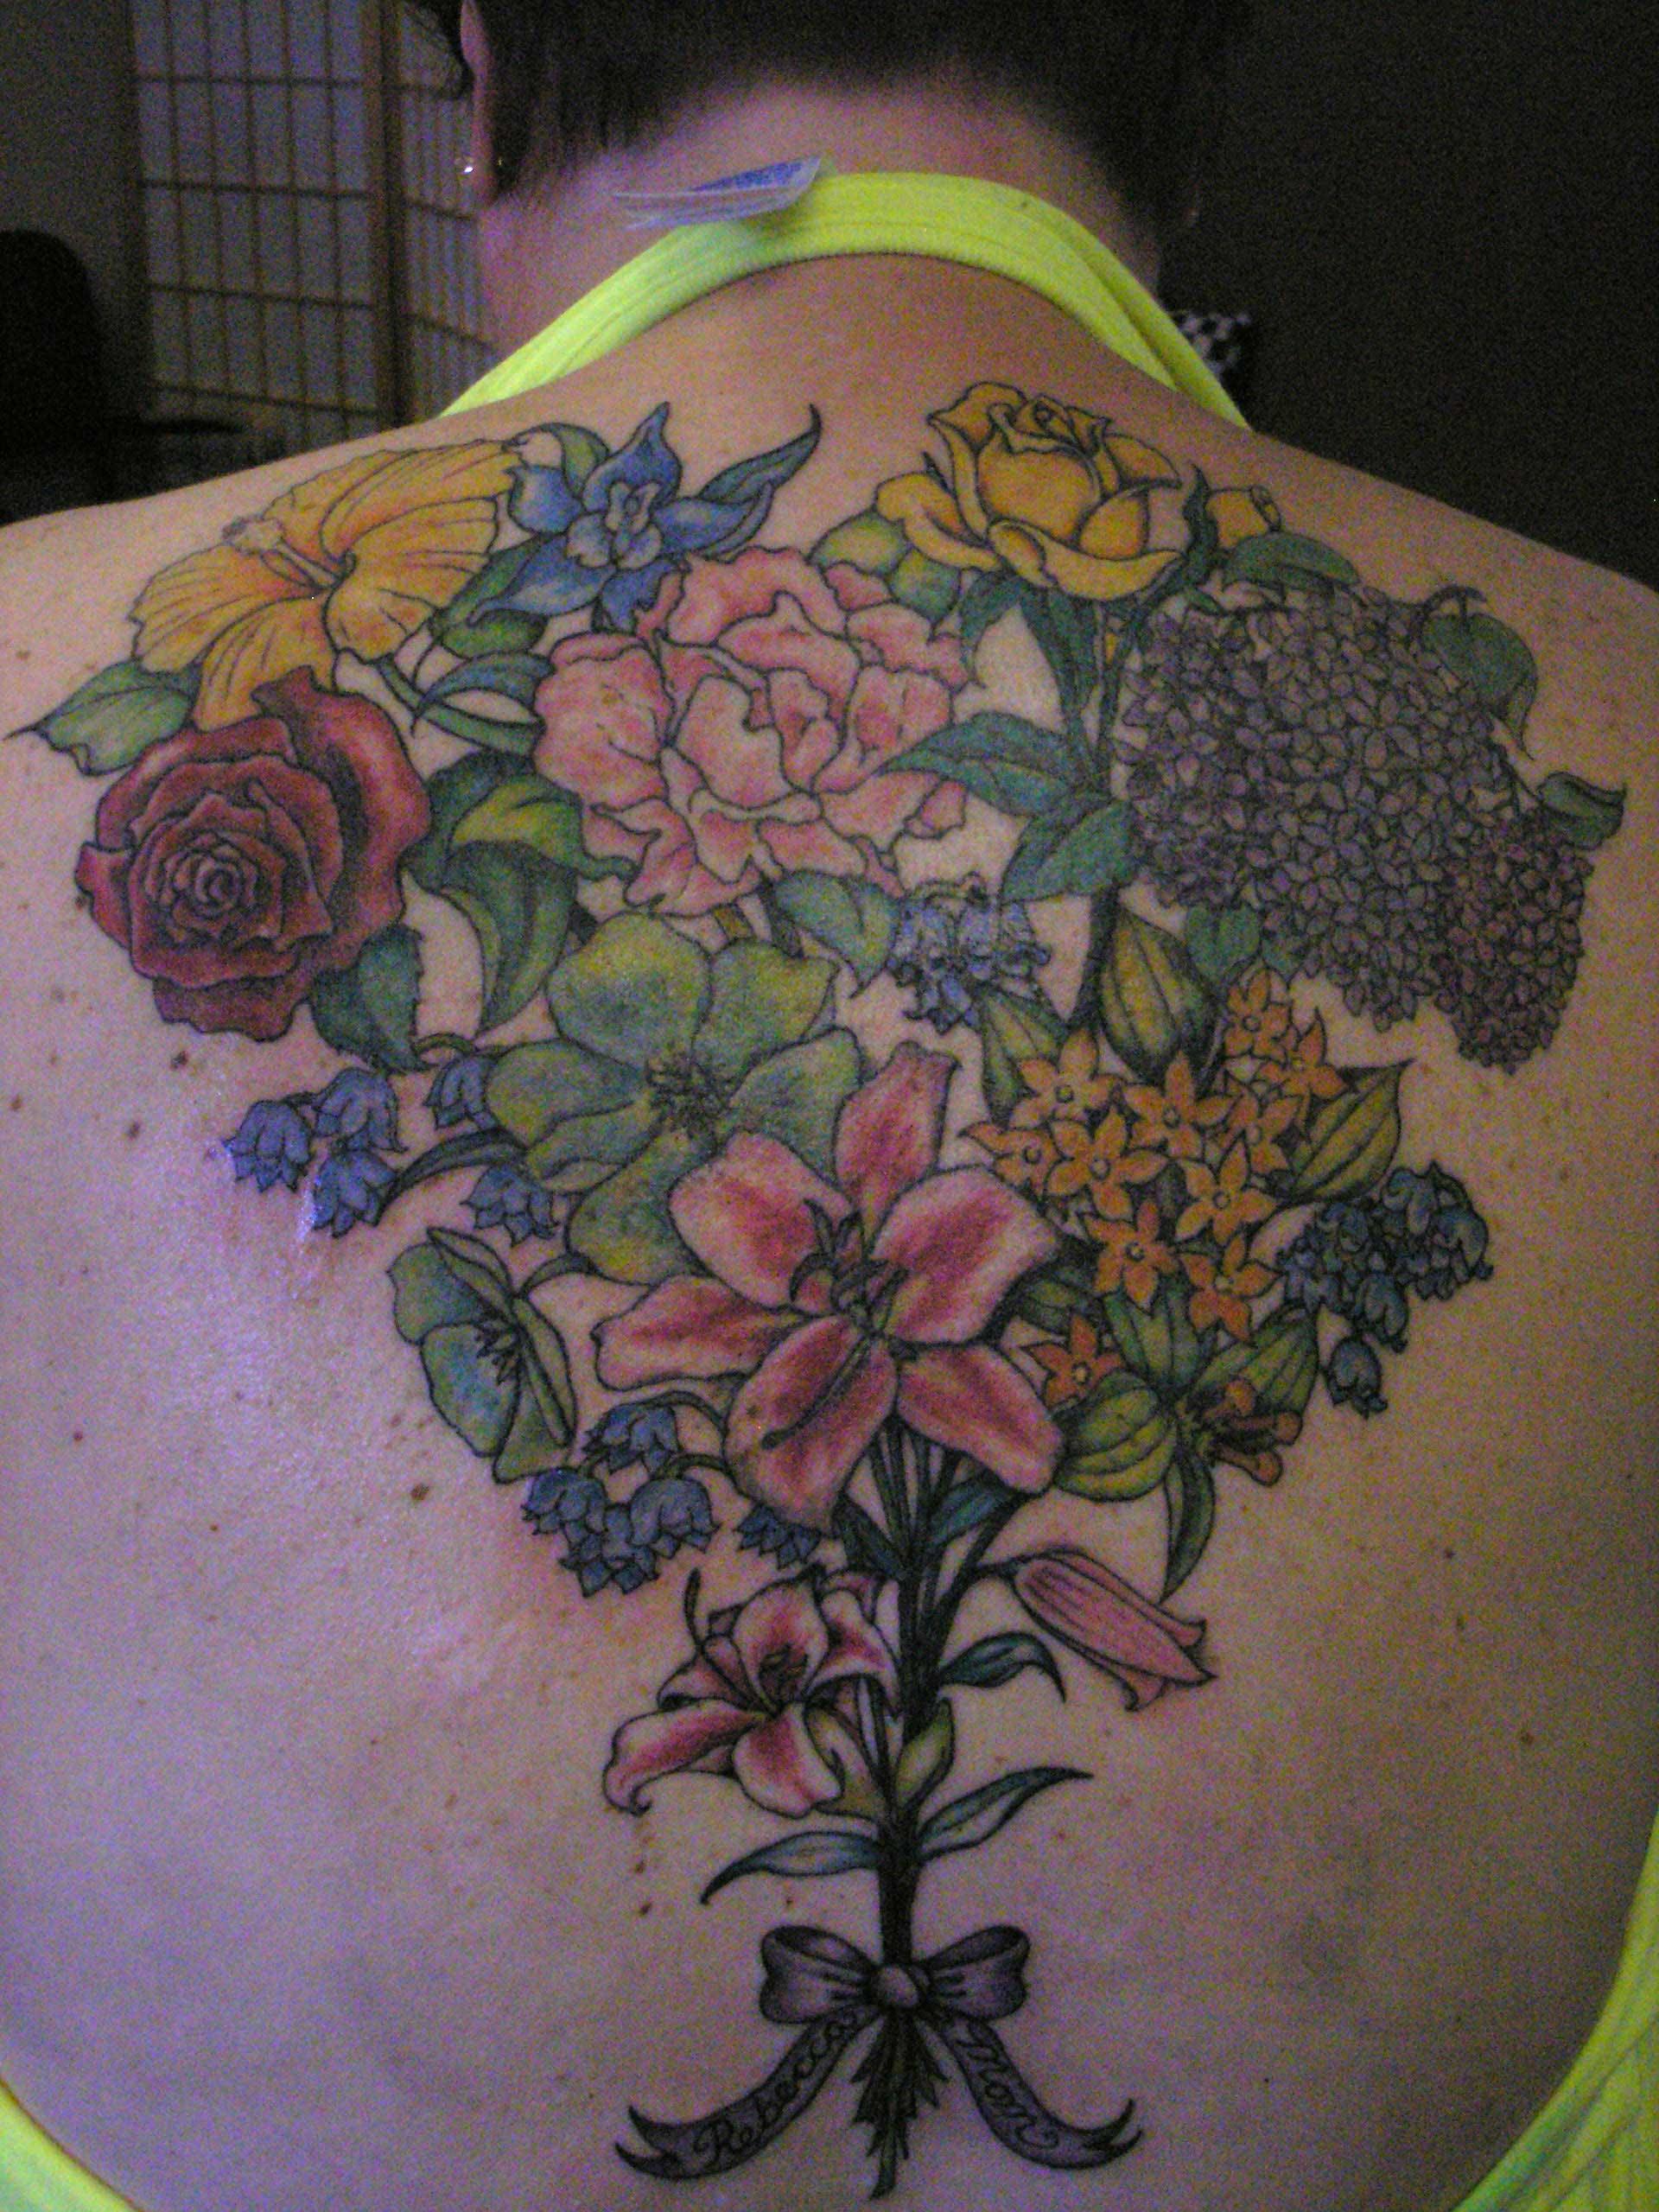 Bouquet Tattoo Tattoos: Fine Art & Tattoos By Molly Rose